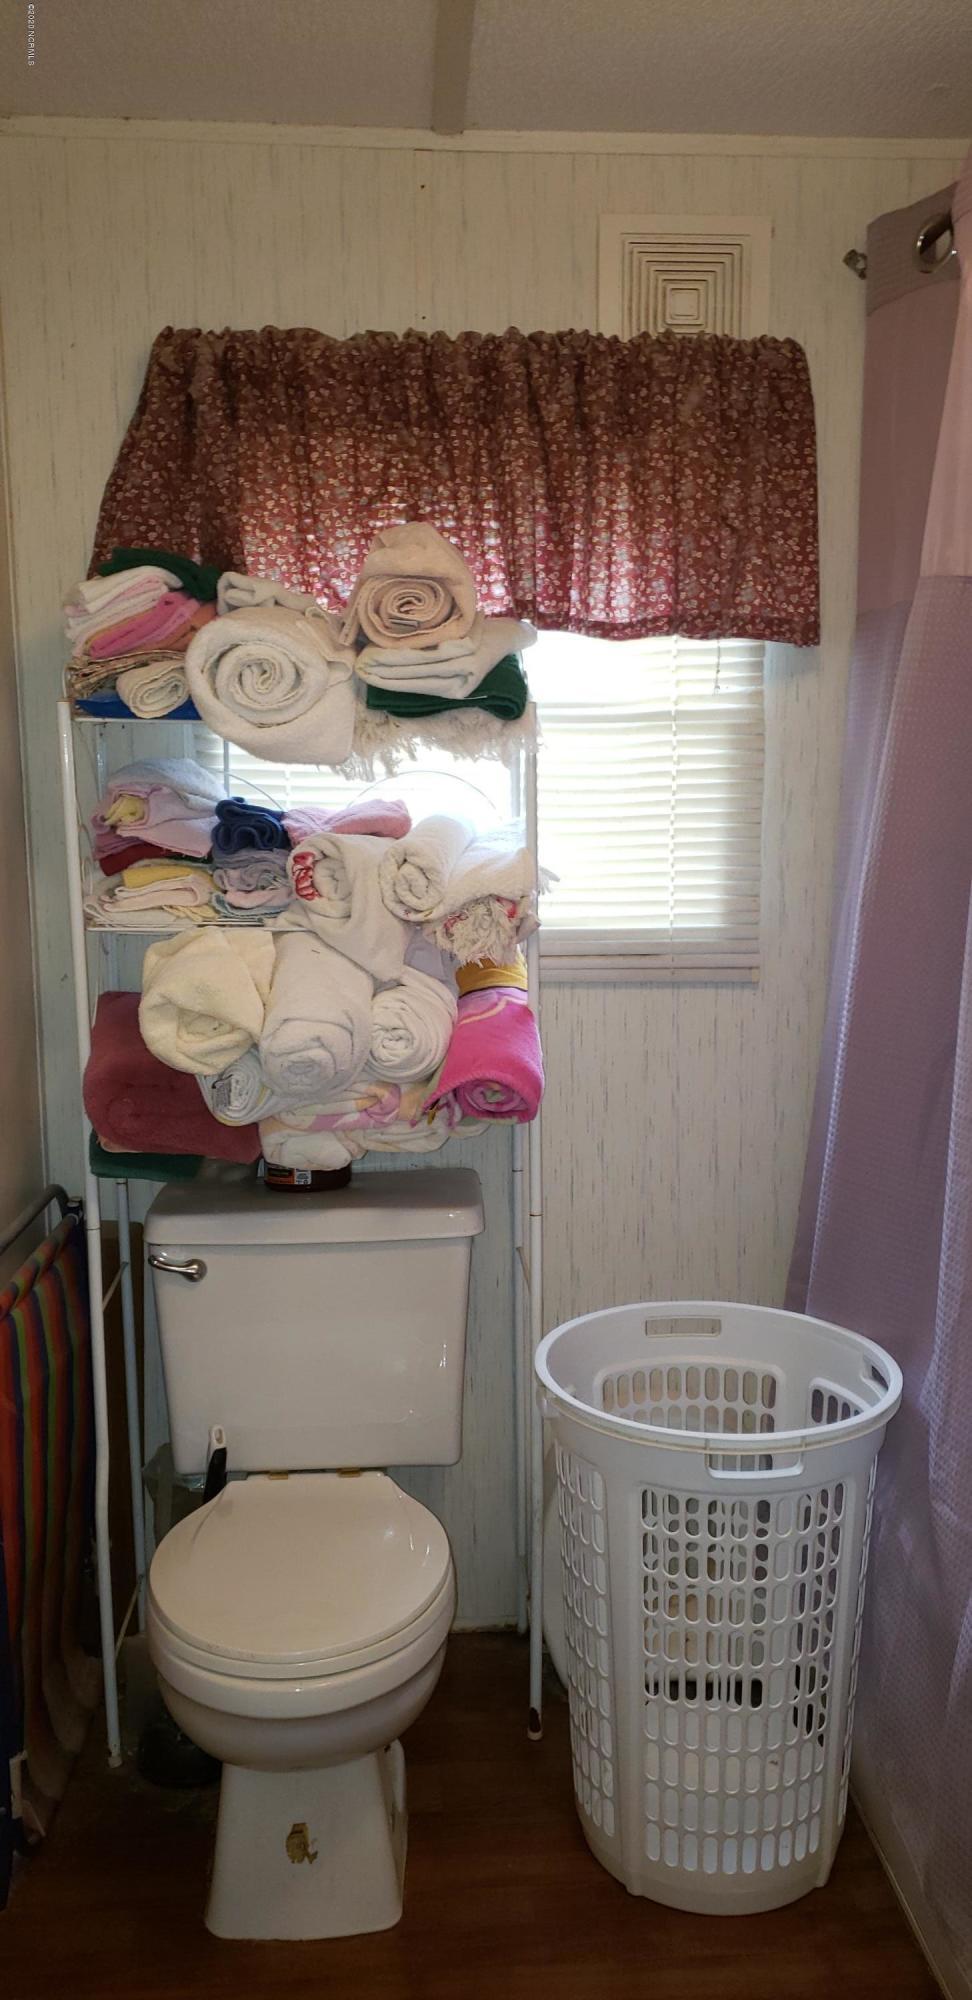 111 R & M Circle, Fremont, North Carolina 27830, 3 Bedrooms Bedrooms, 9 Rooms Rooms,2 BathroomsBathrooms,Manufactured home,For sale,R & M,100219575